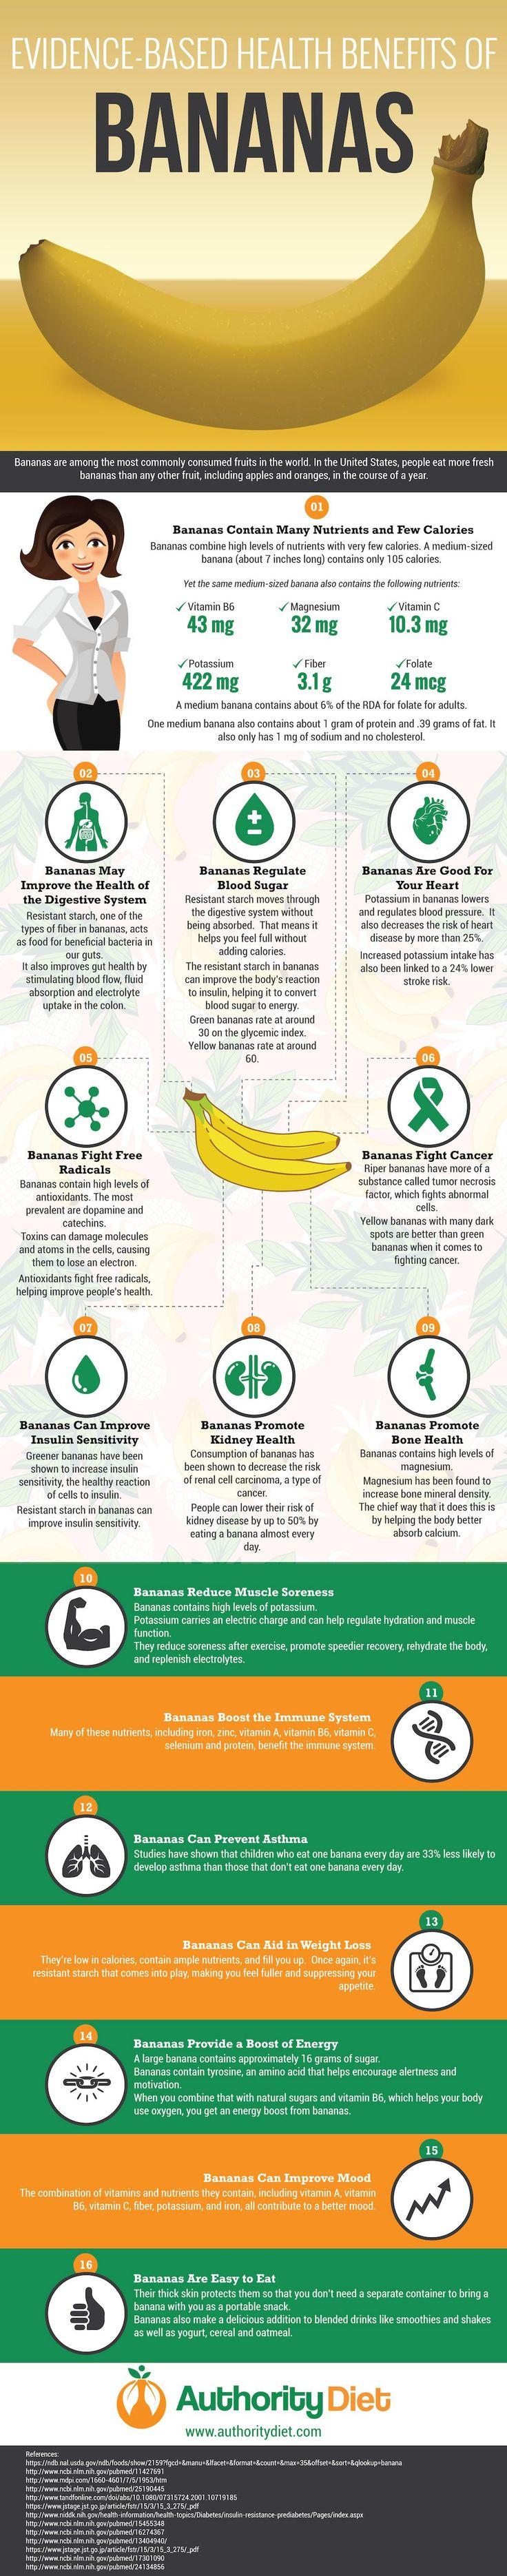 Evidence-Based Health Benefits Of Bananas #Infographic #Banana #Health